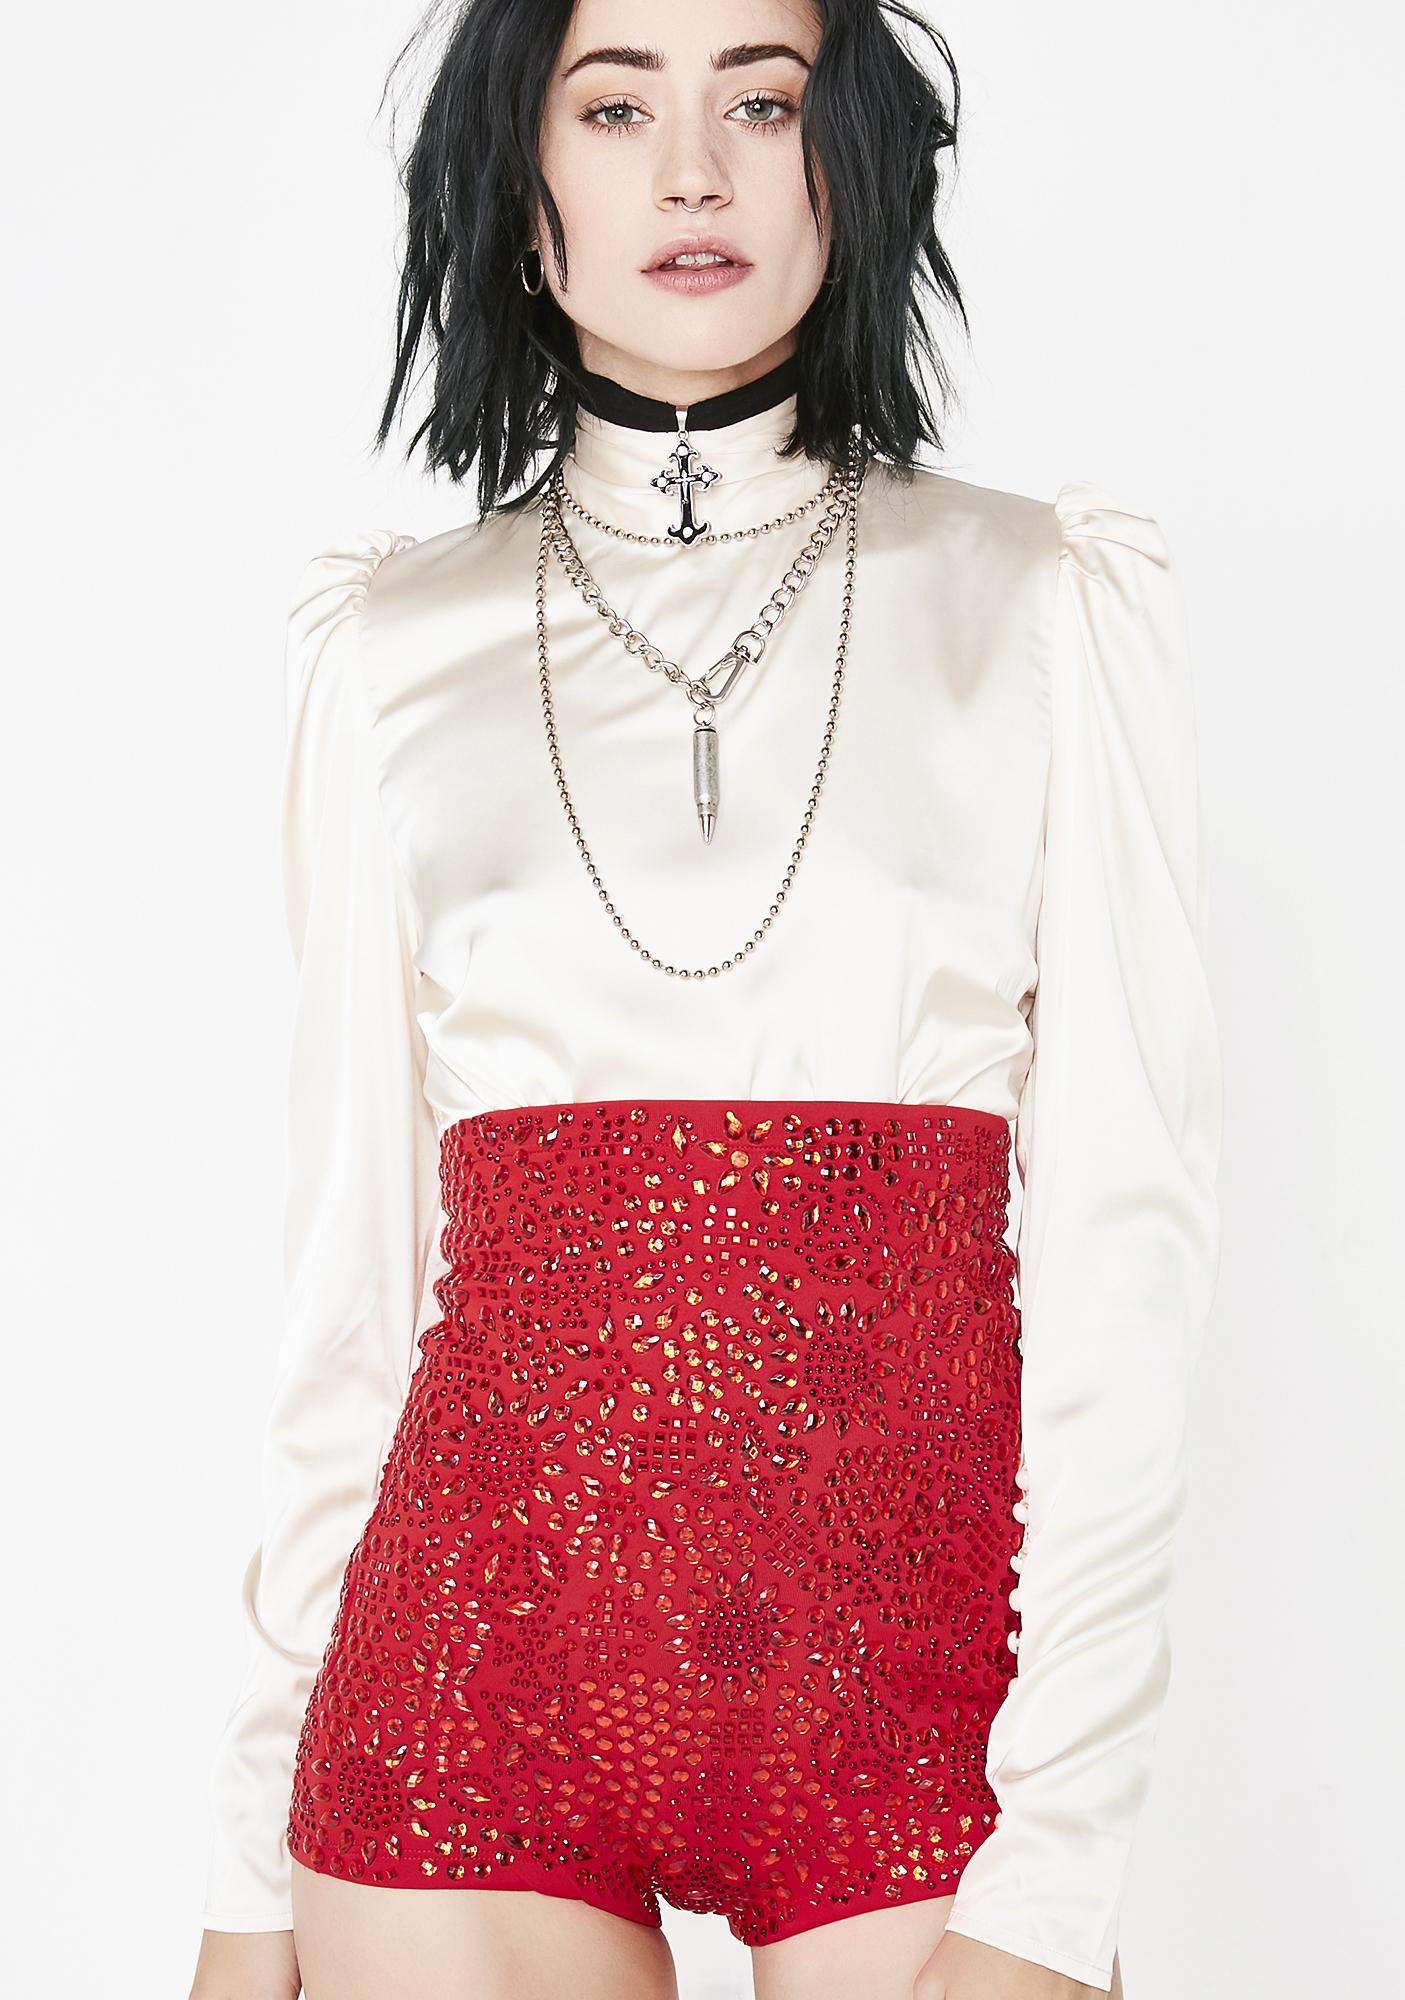 Kiki Riki Fire Crystallized Chaos Sequin Short